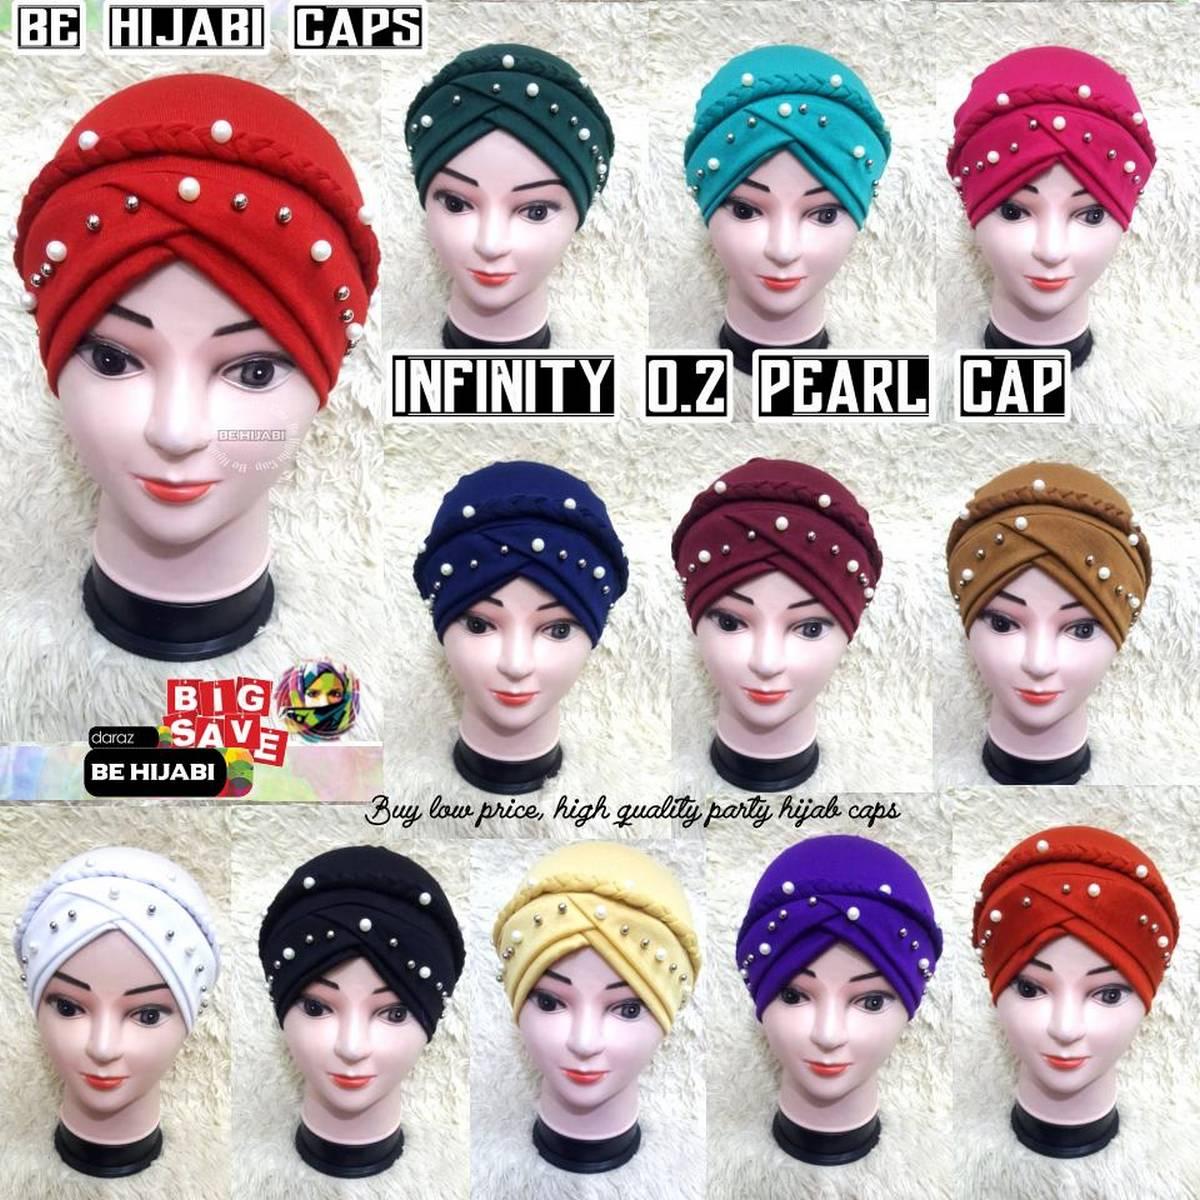 Muslim Scarf Womens Muslim Hats Hijab Underscarf Caps Turban Headwrap Bonnet Hat